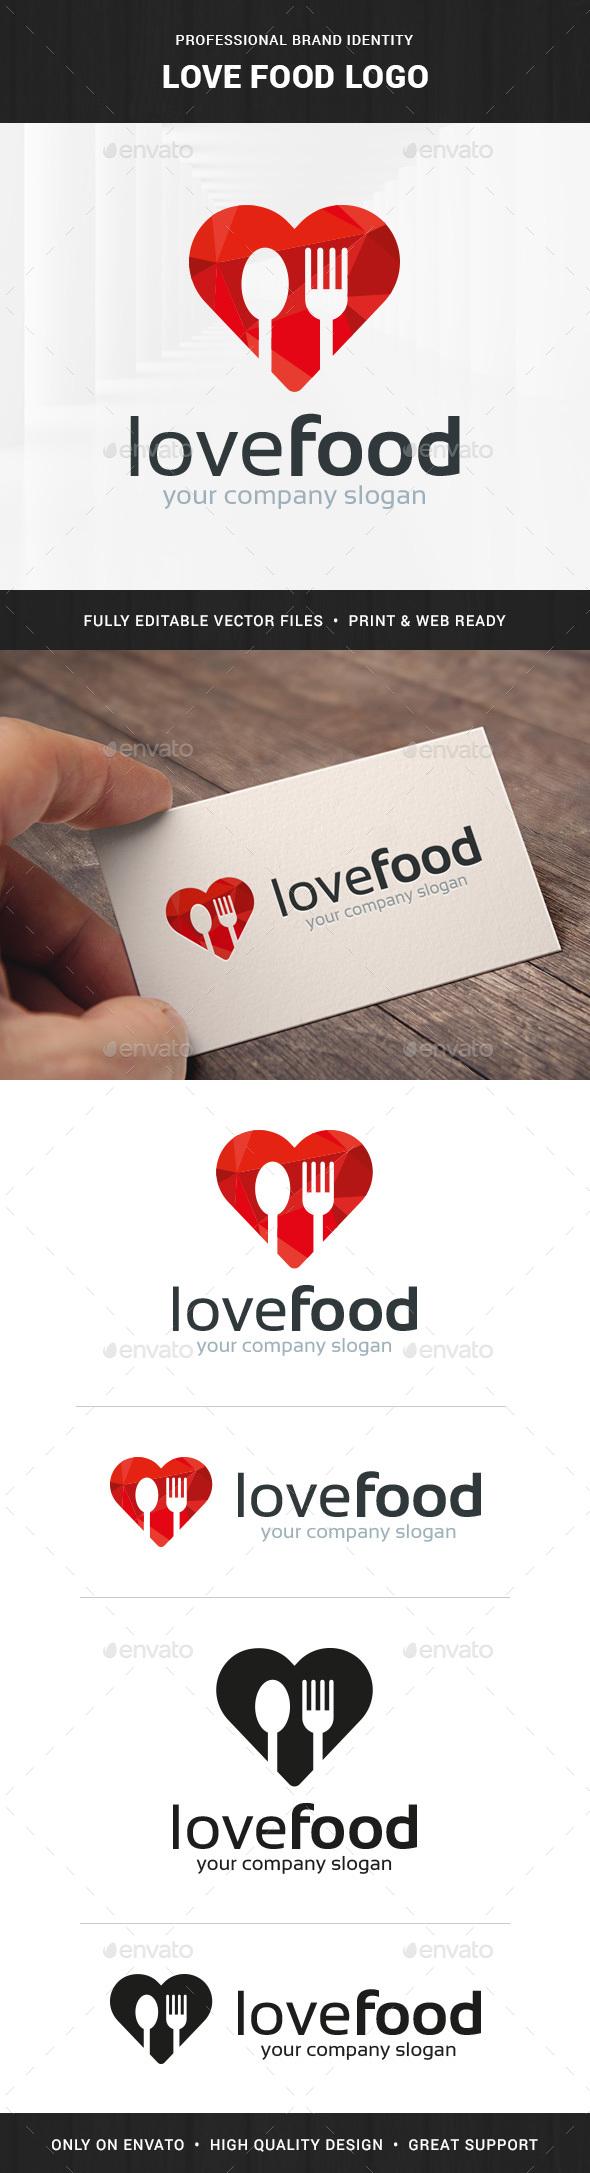 Love Food Logo Template v2